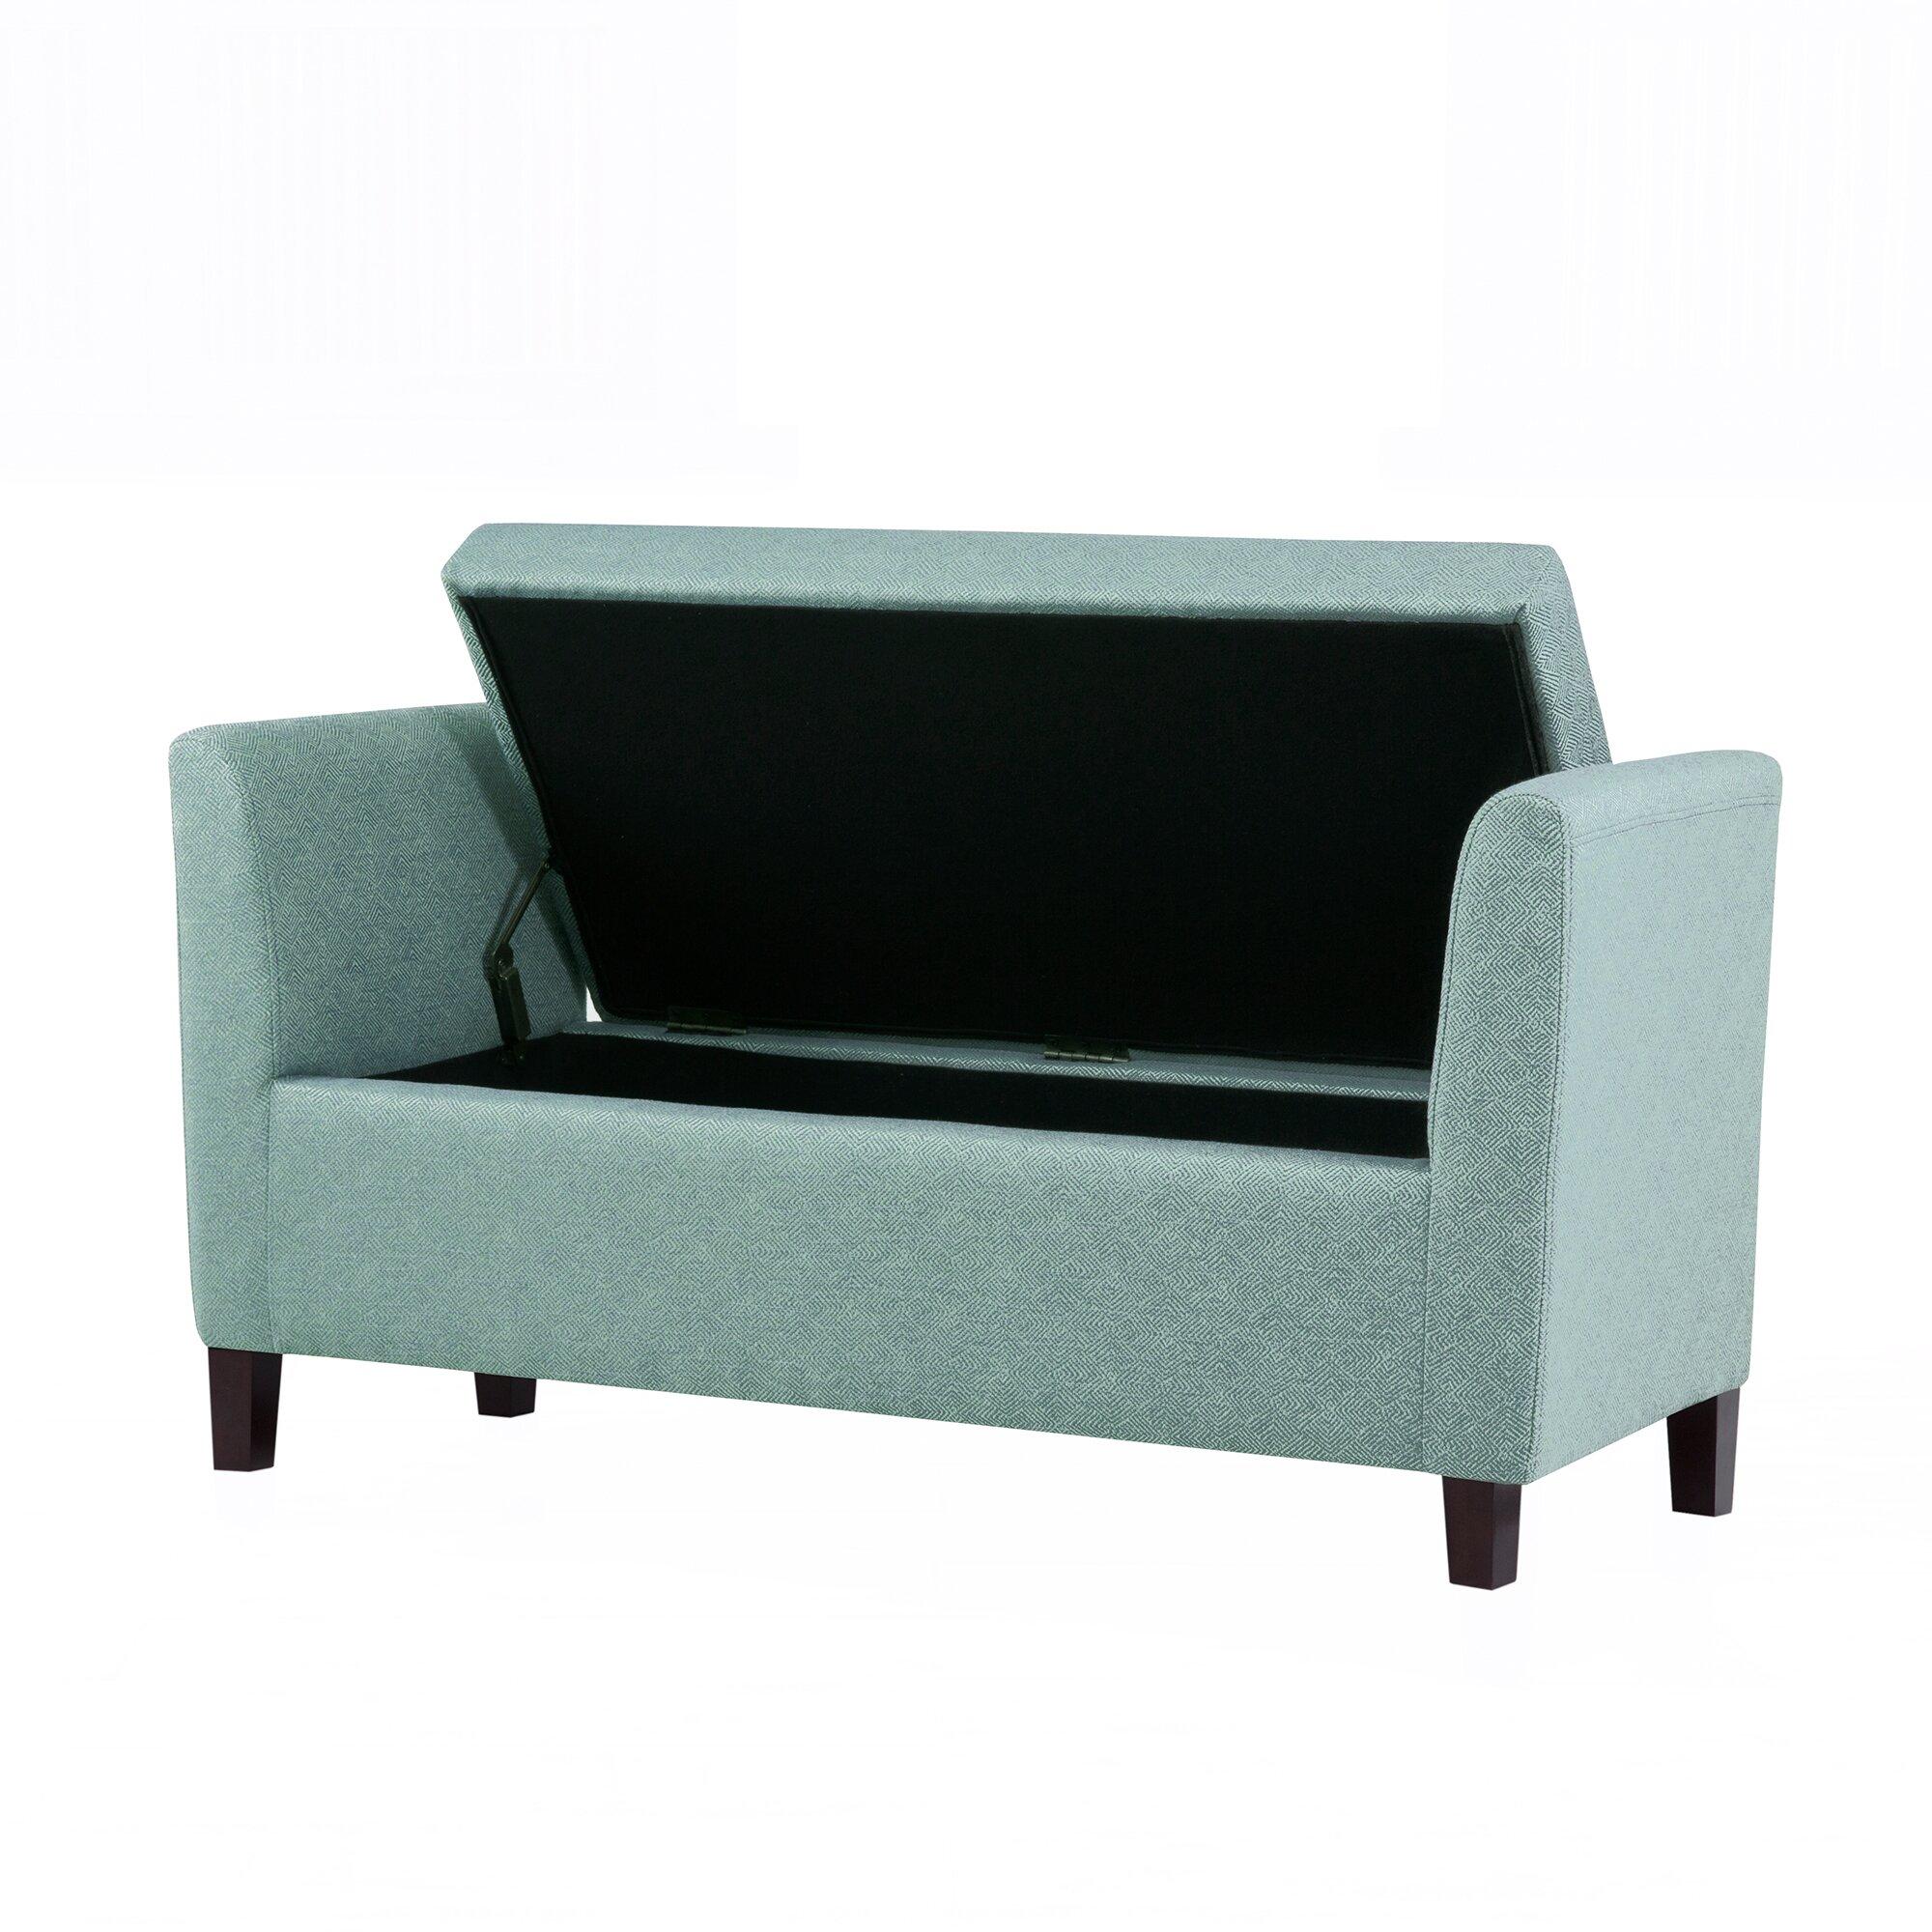 studio craig upholstered storage bedroom bench reviews wayfair